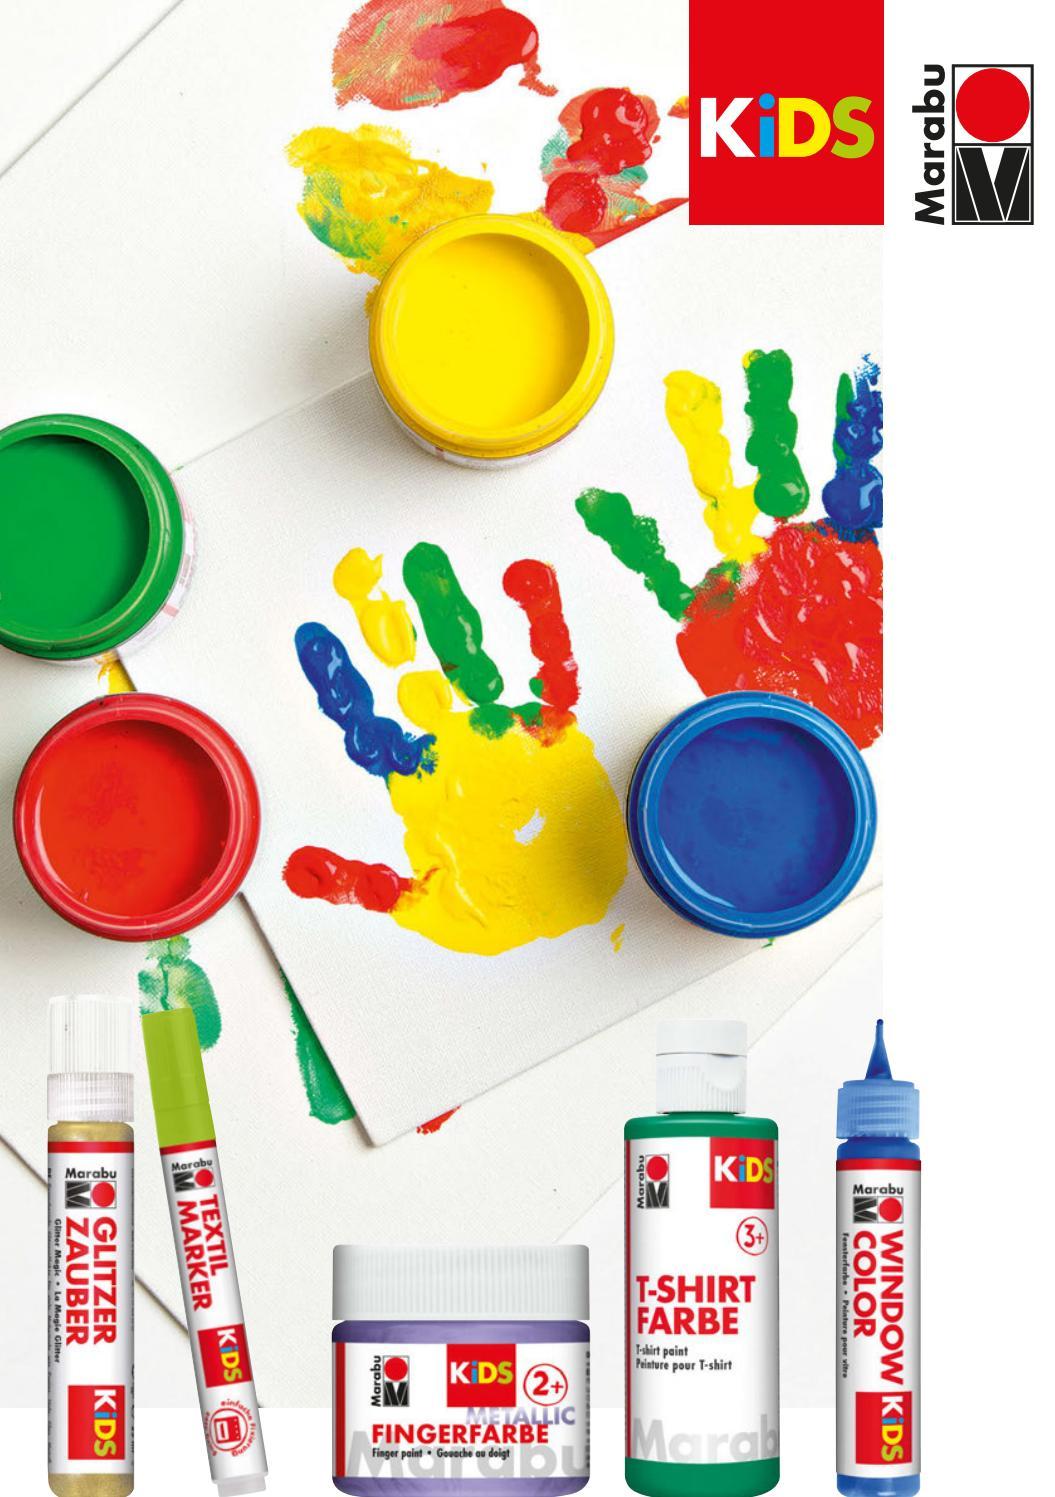 Marabu KiDS Window Color 10er Set farbig sortiert